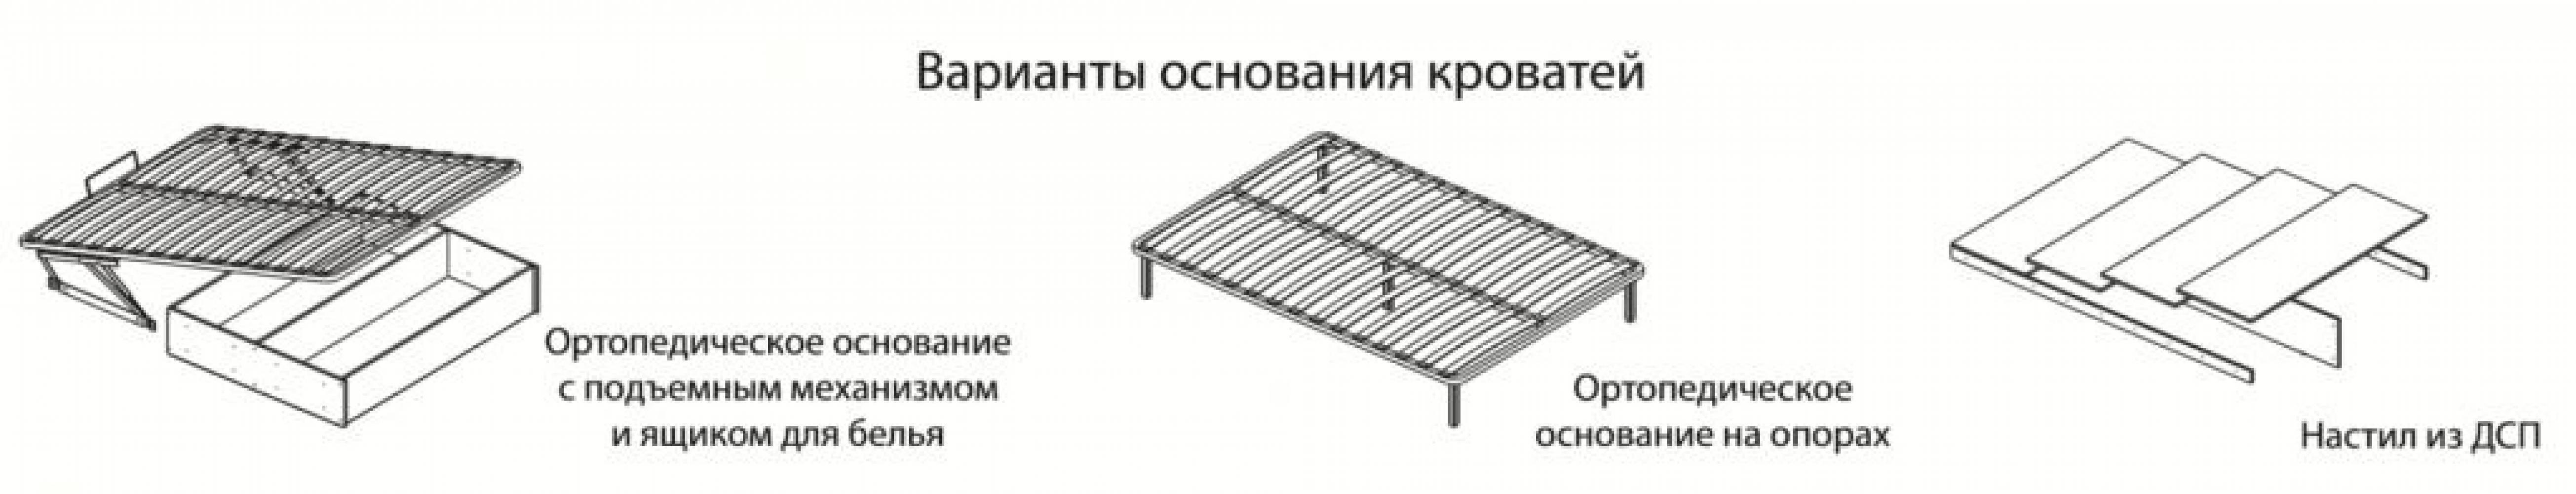 Спальня Ричард Ясень Анкор Светлый. Комплект 1